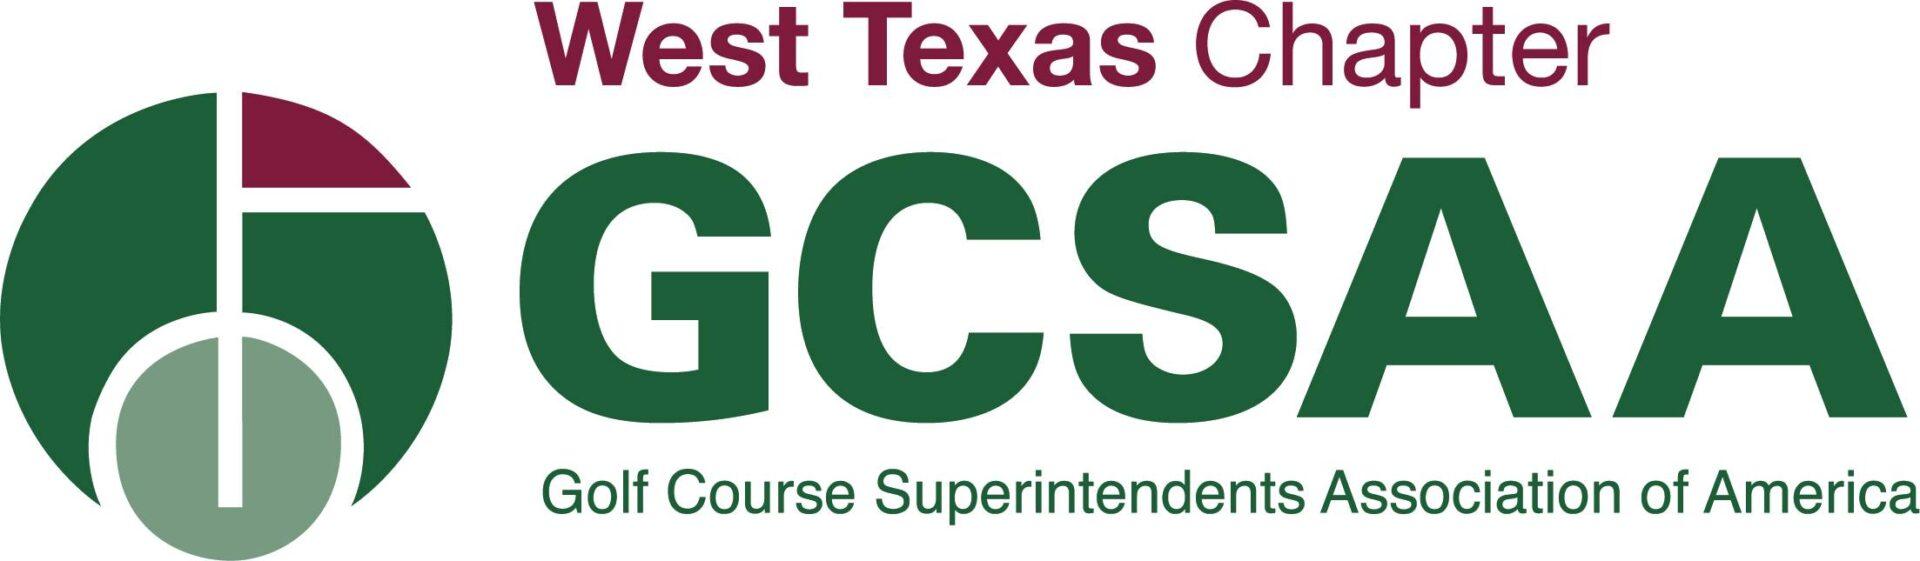 West Texas Chapter GCSAA